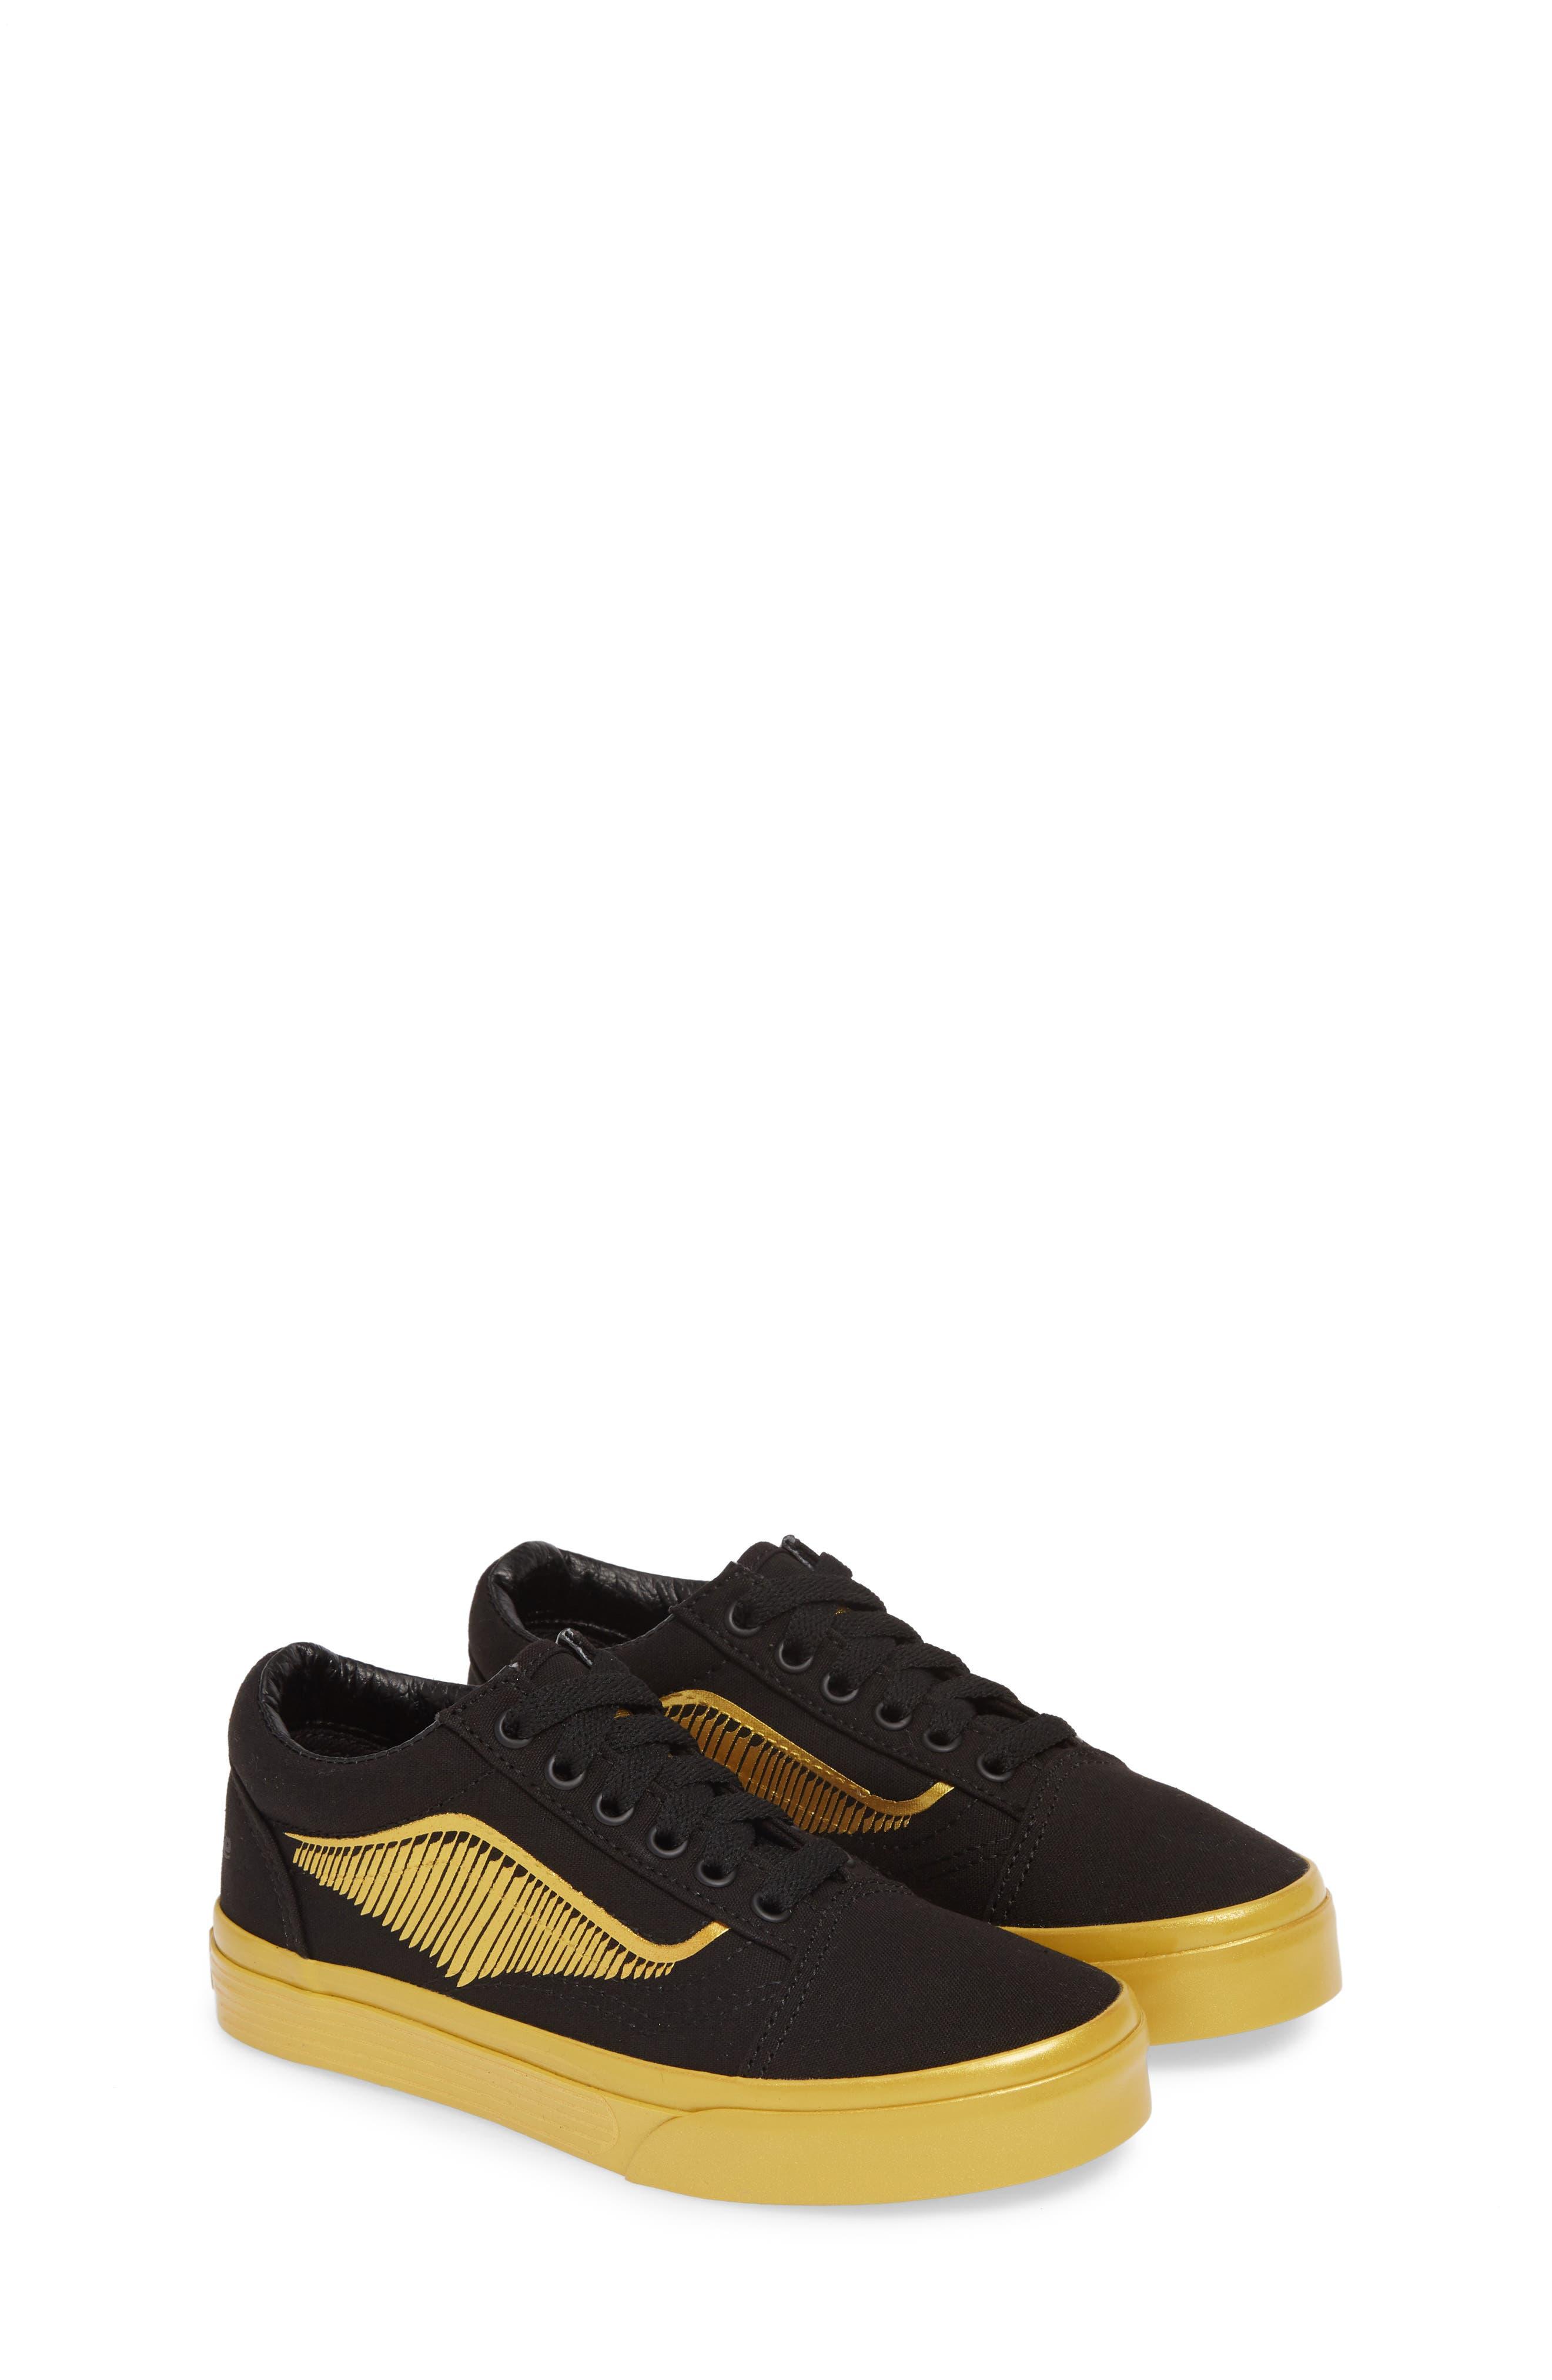 Toddler Vans X Harry Potter Old Skool Sneaker Size 2 M  Black